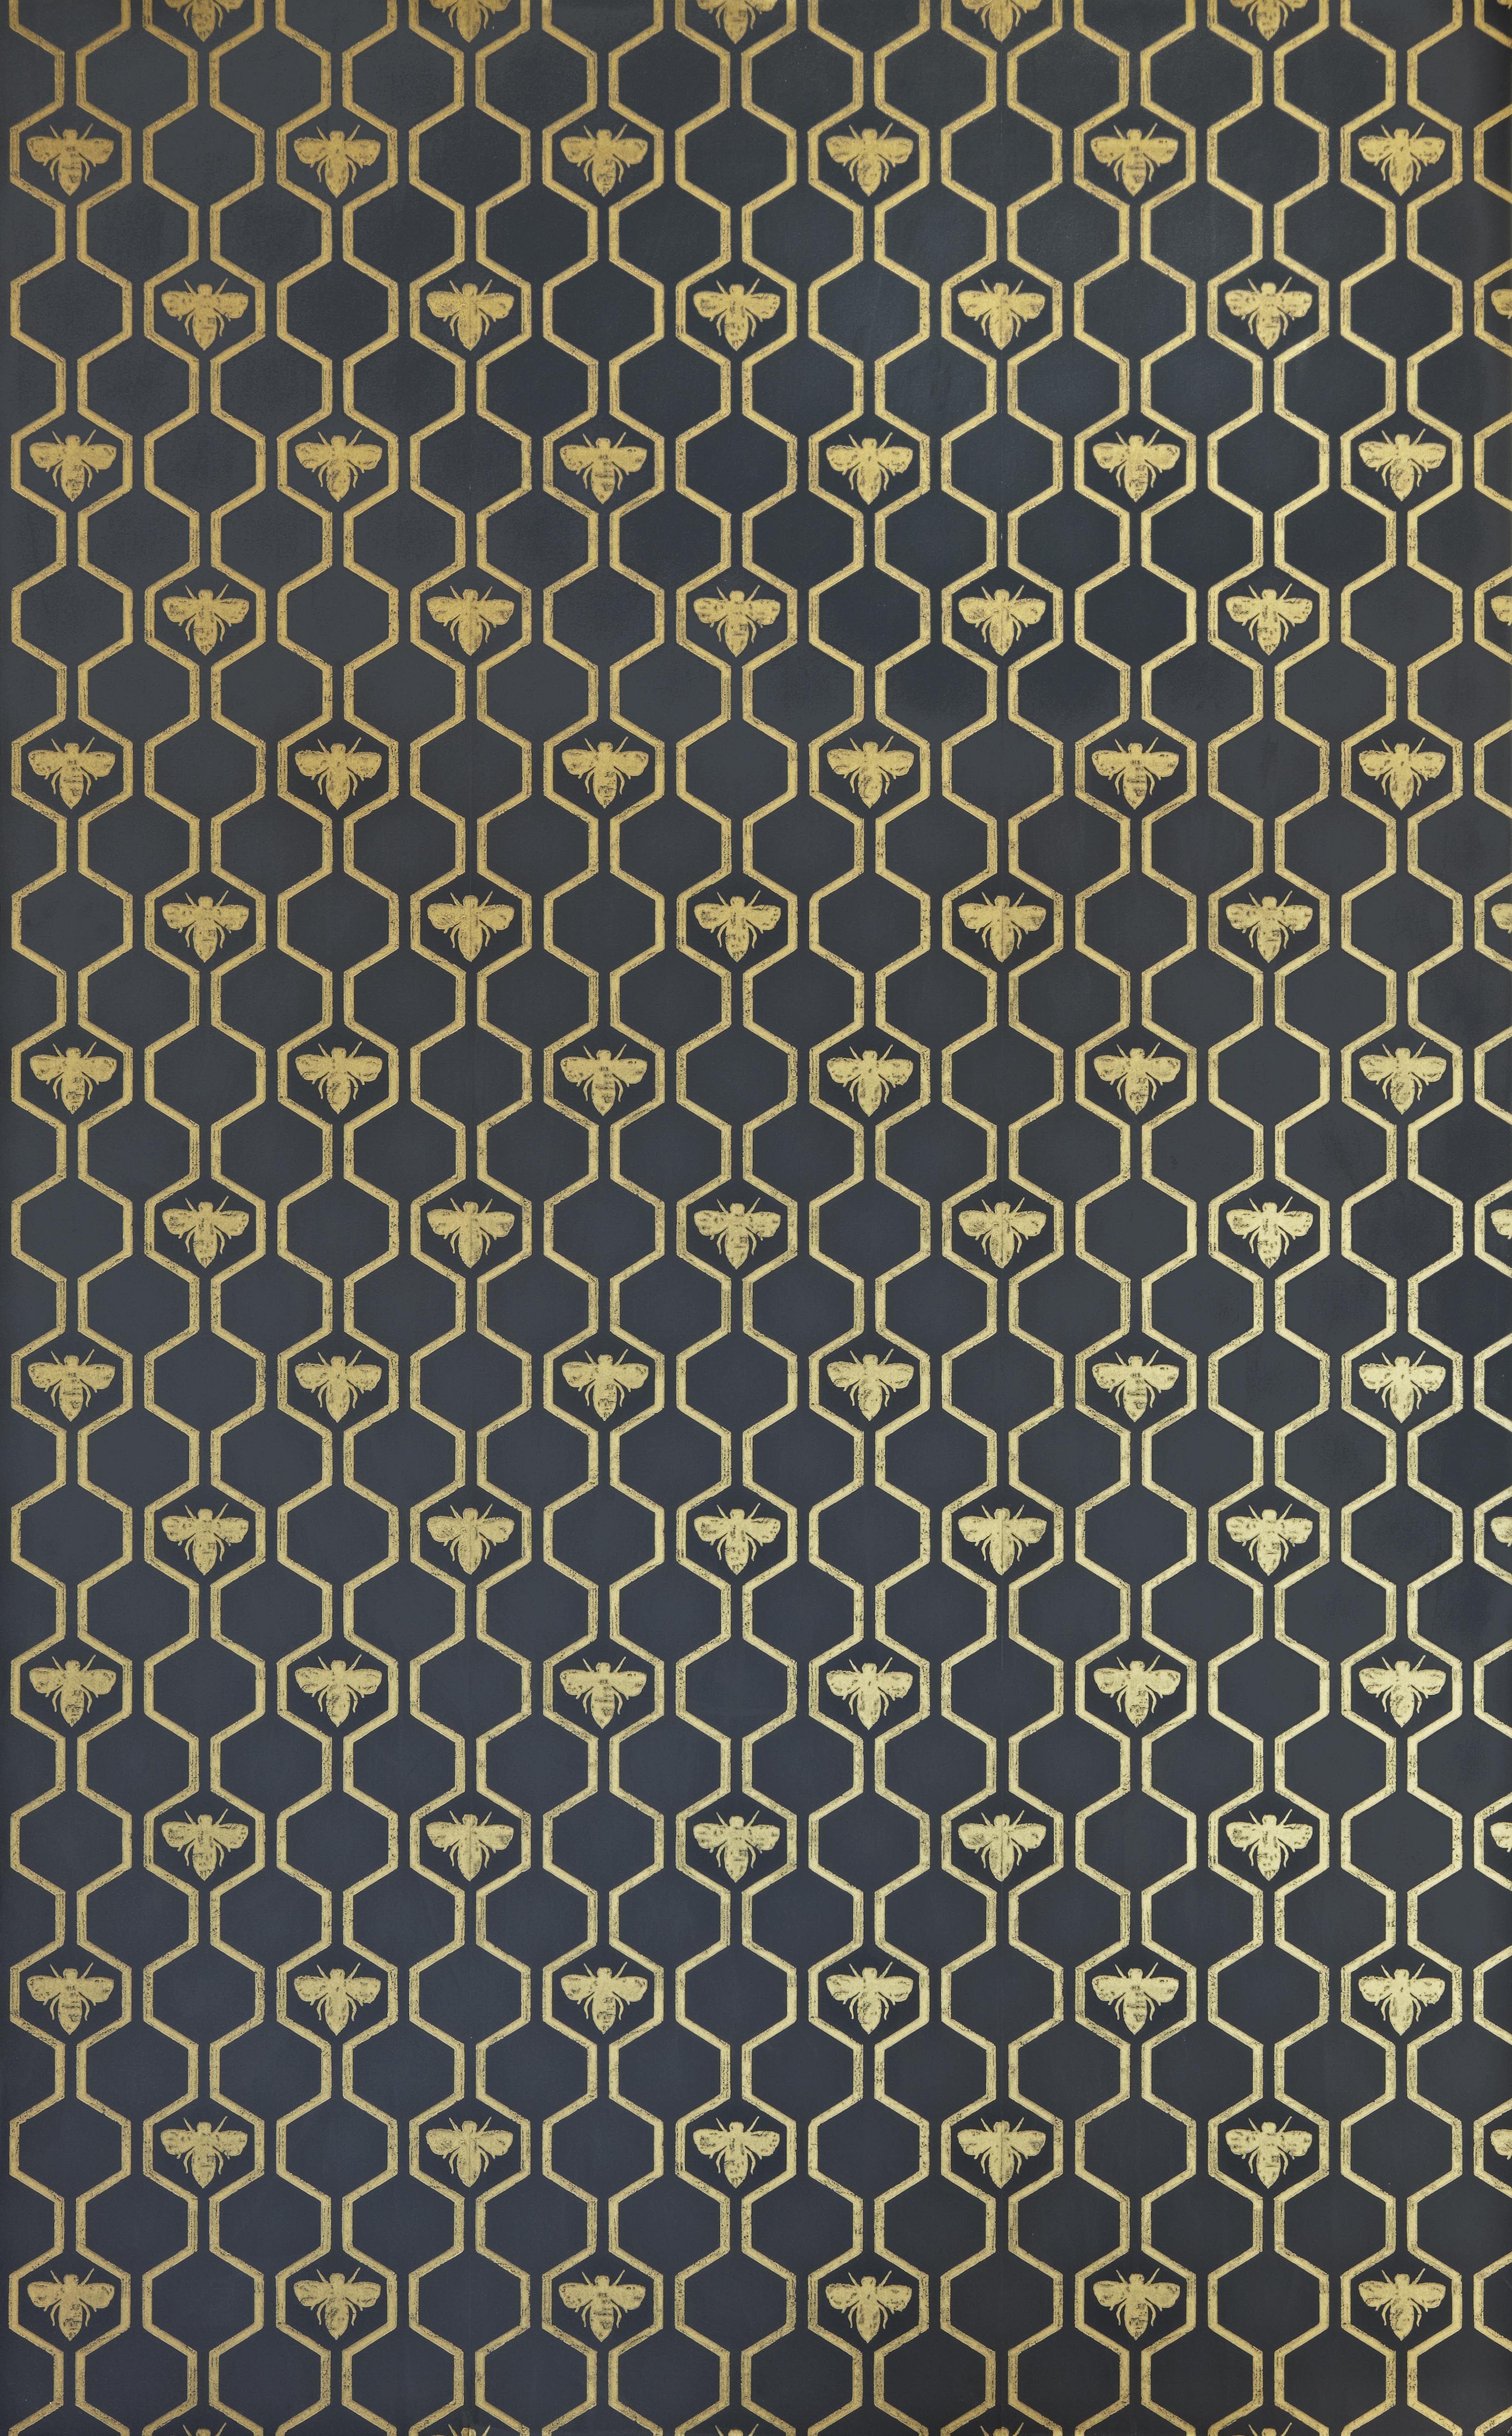 Honey Bees Wallpaper Bees Honey And Wallpaper